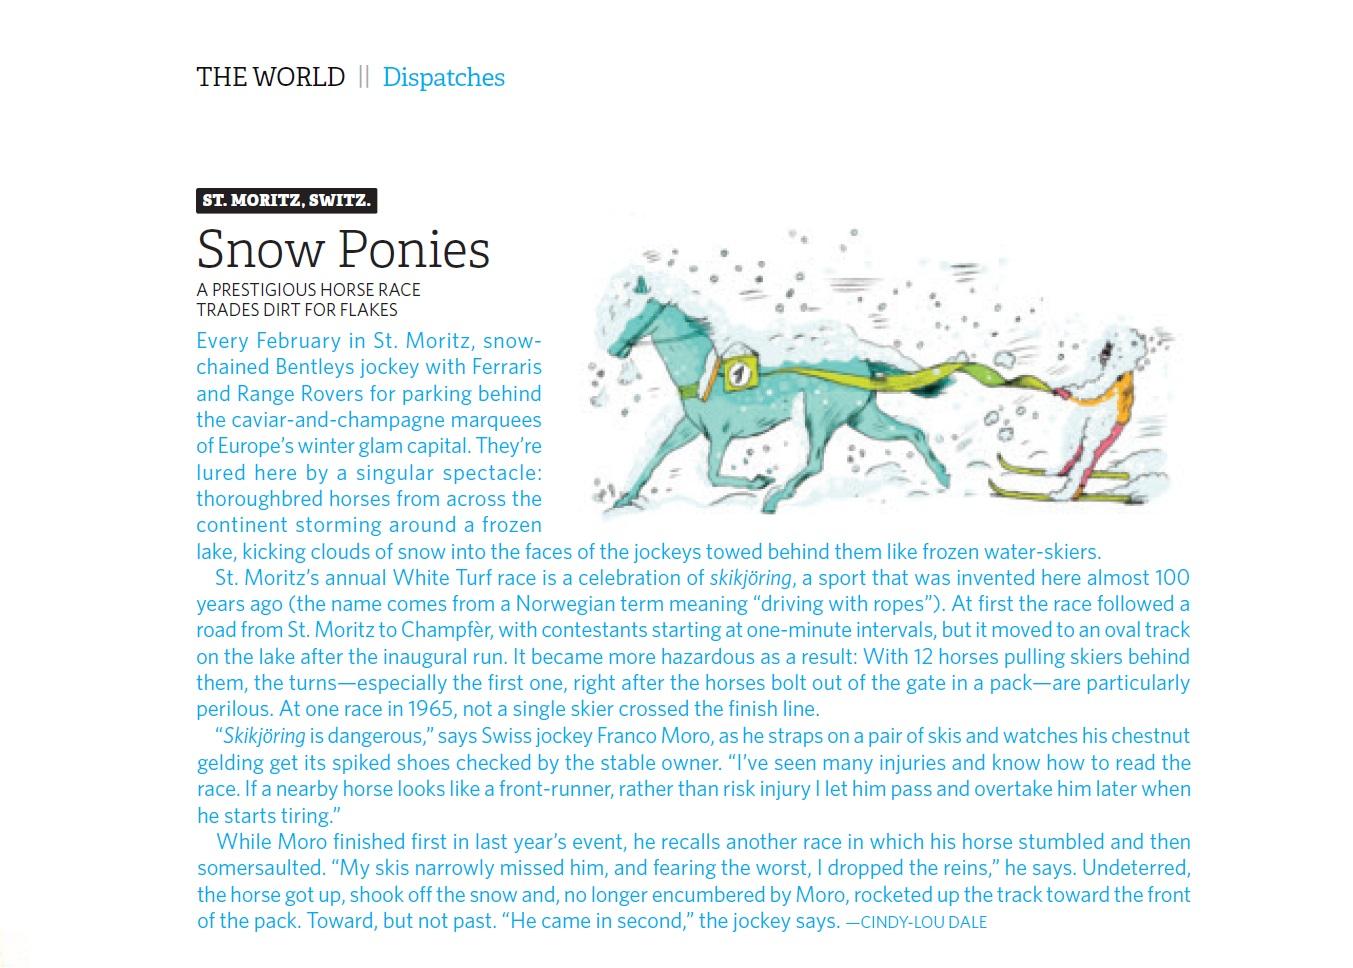 Hemispheres Inflight, USA - St Moritz